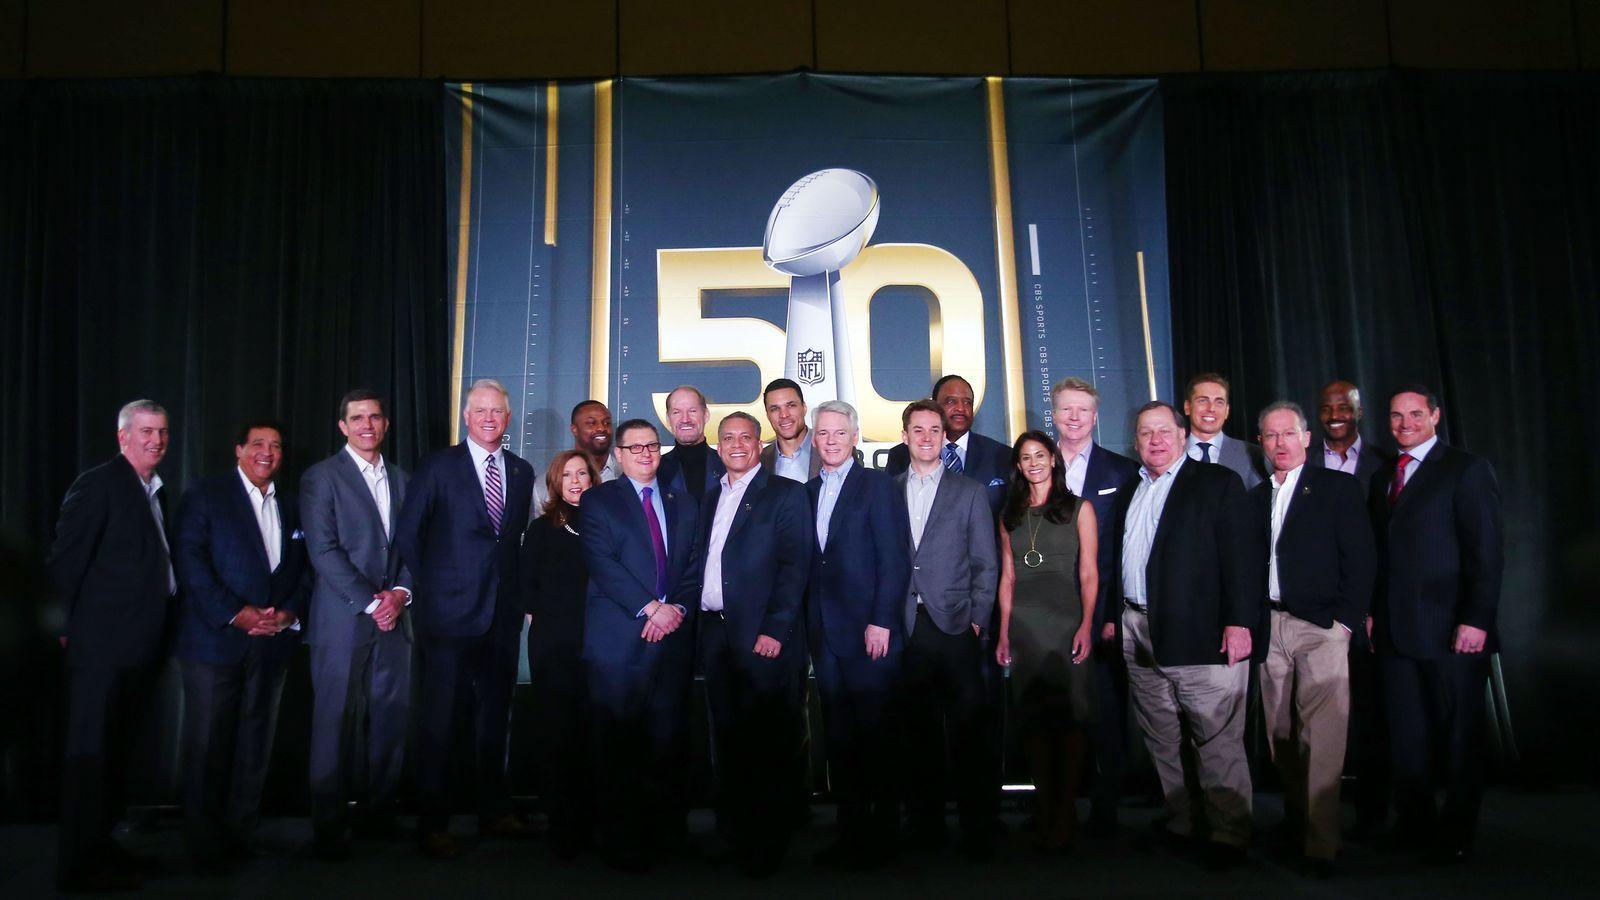 CBS, NFLN, ESPN pregame show lineup for Super Bowl Super